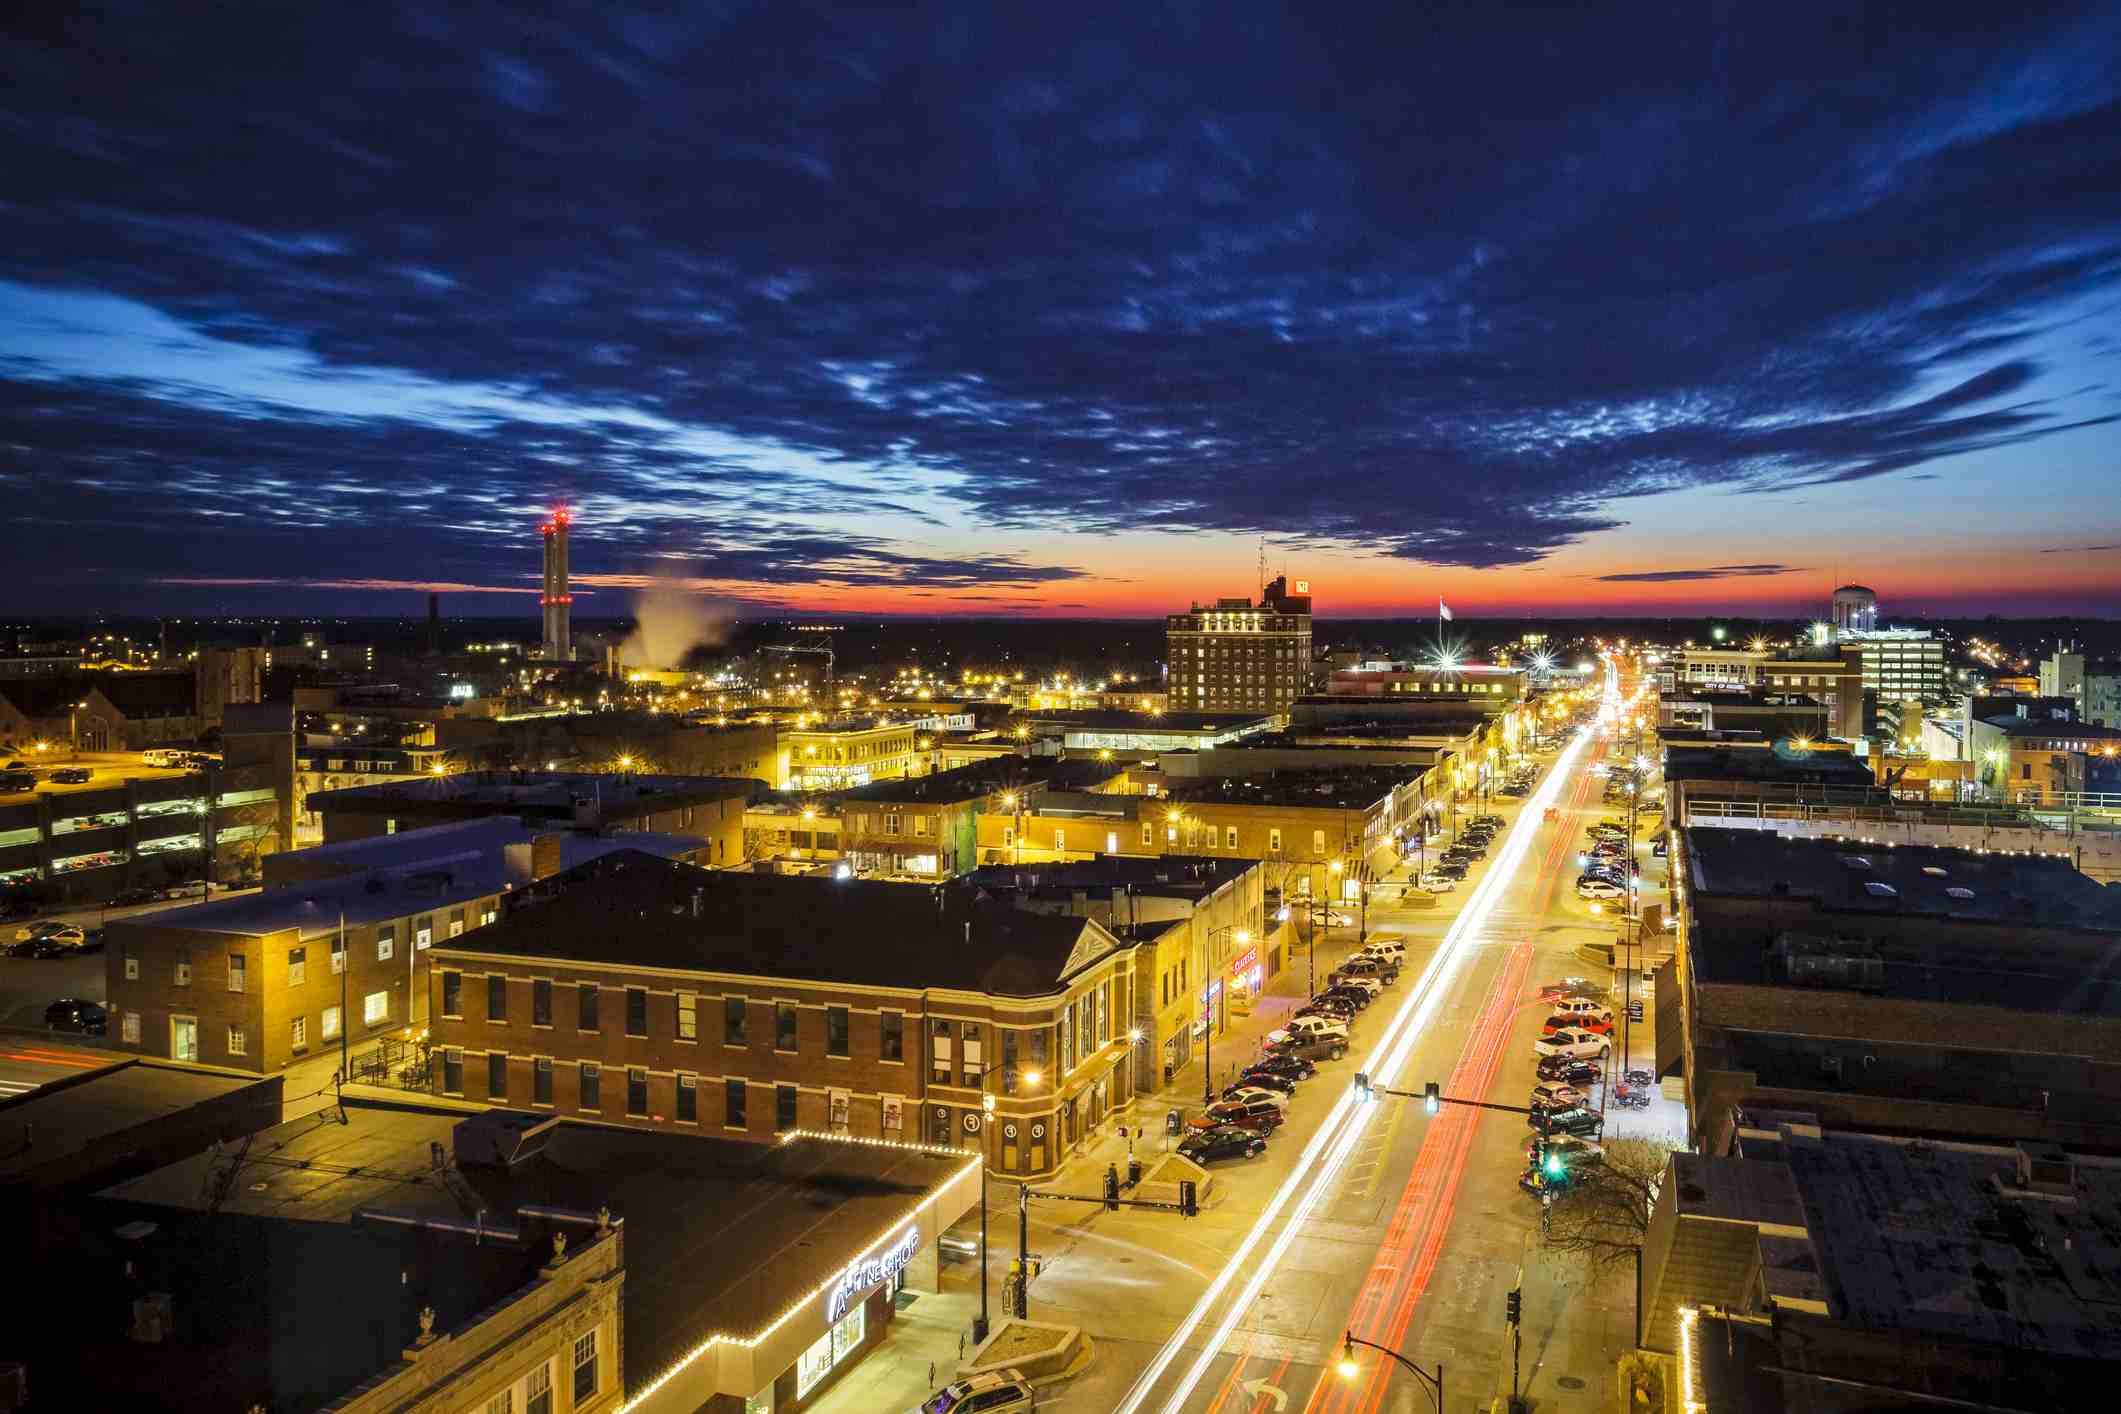 Skyline of Columbia, Missouri